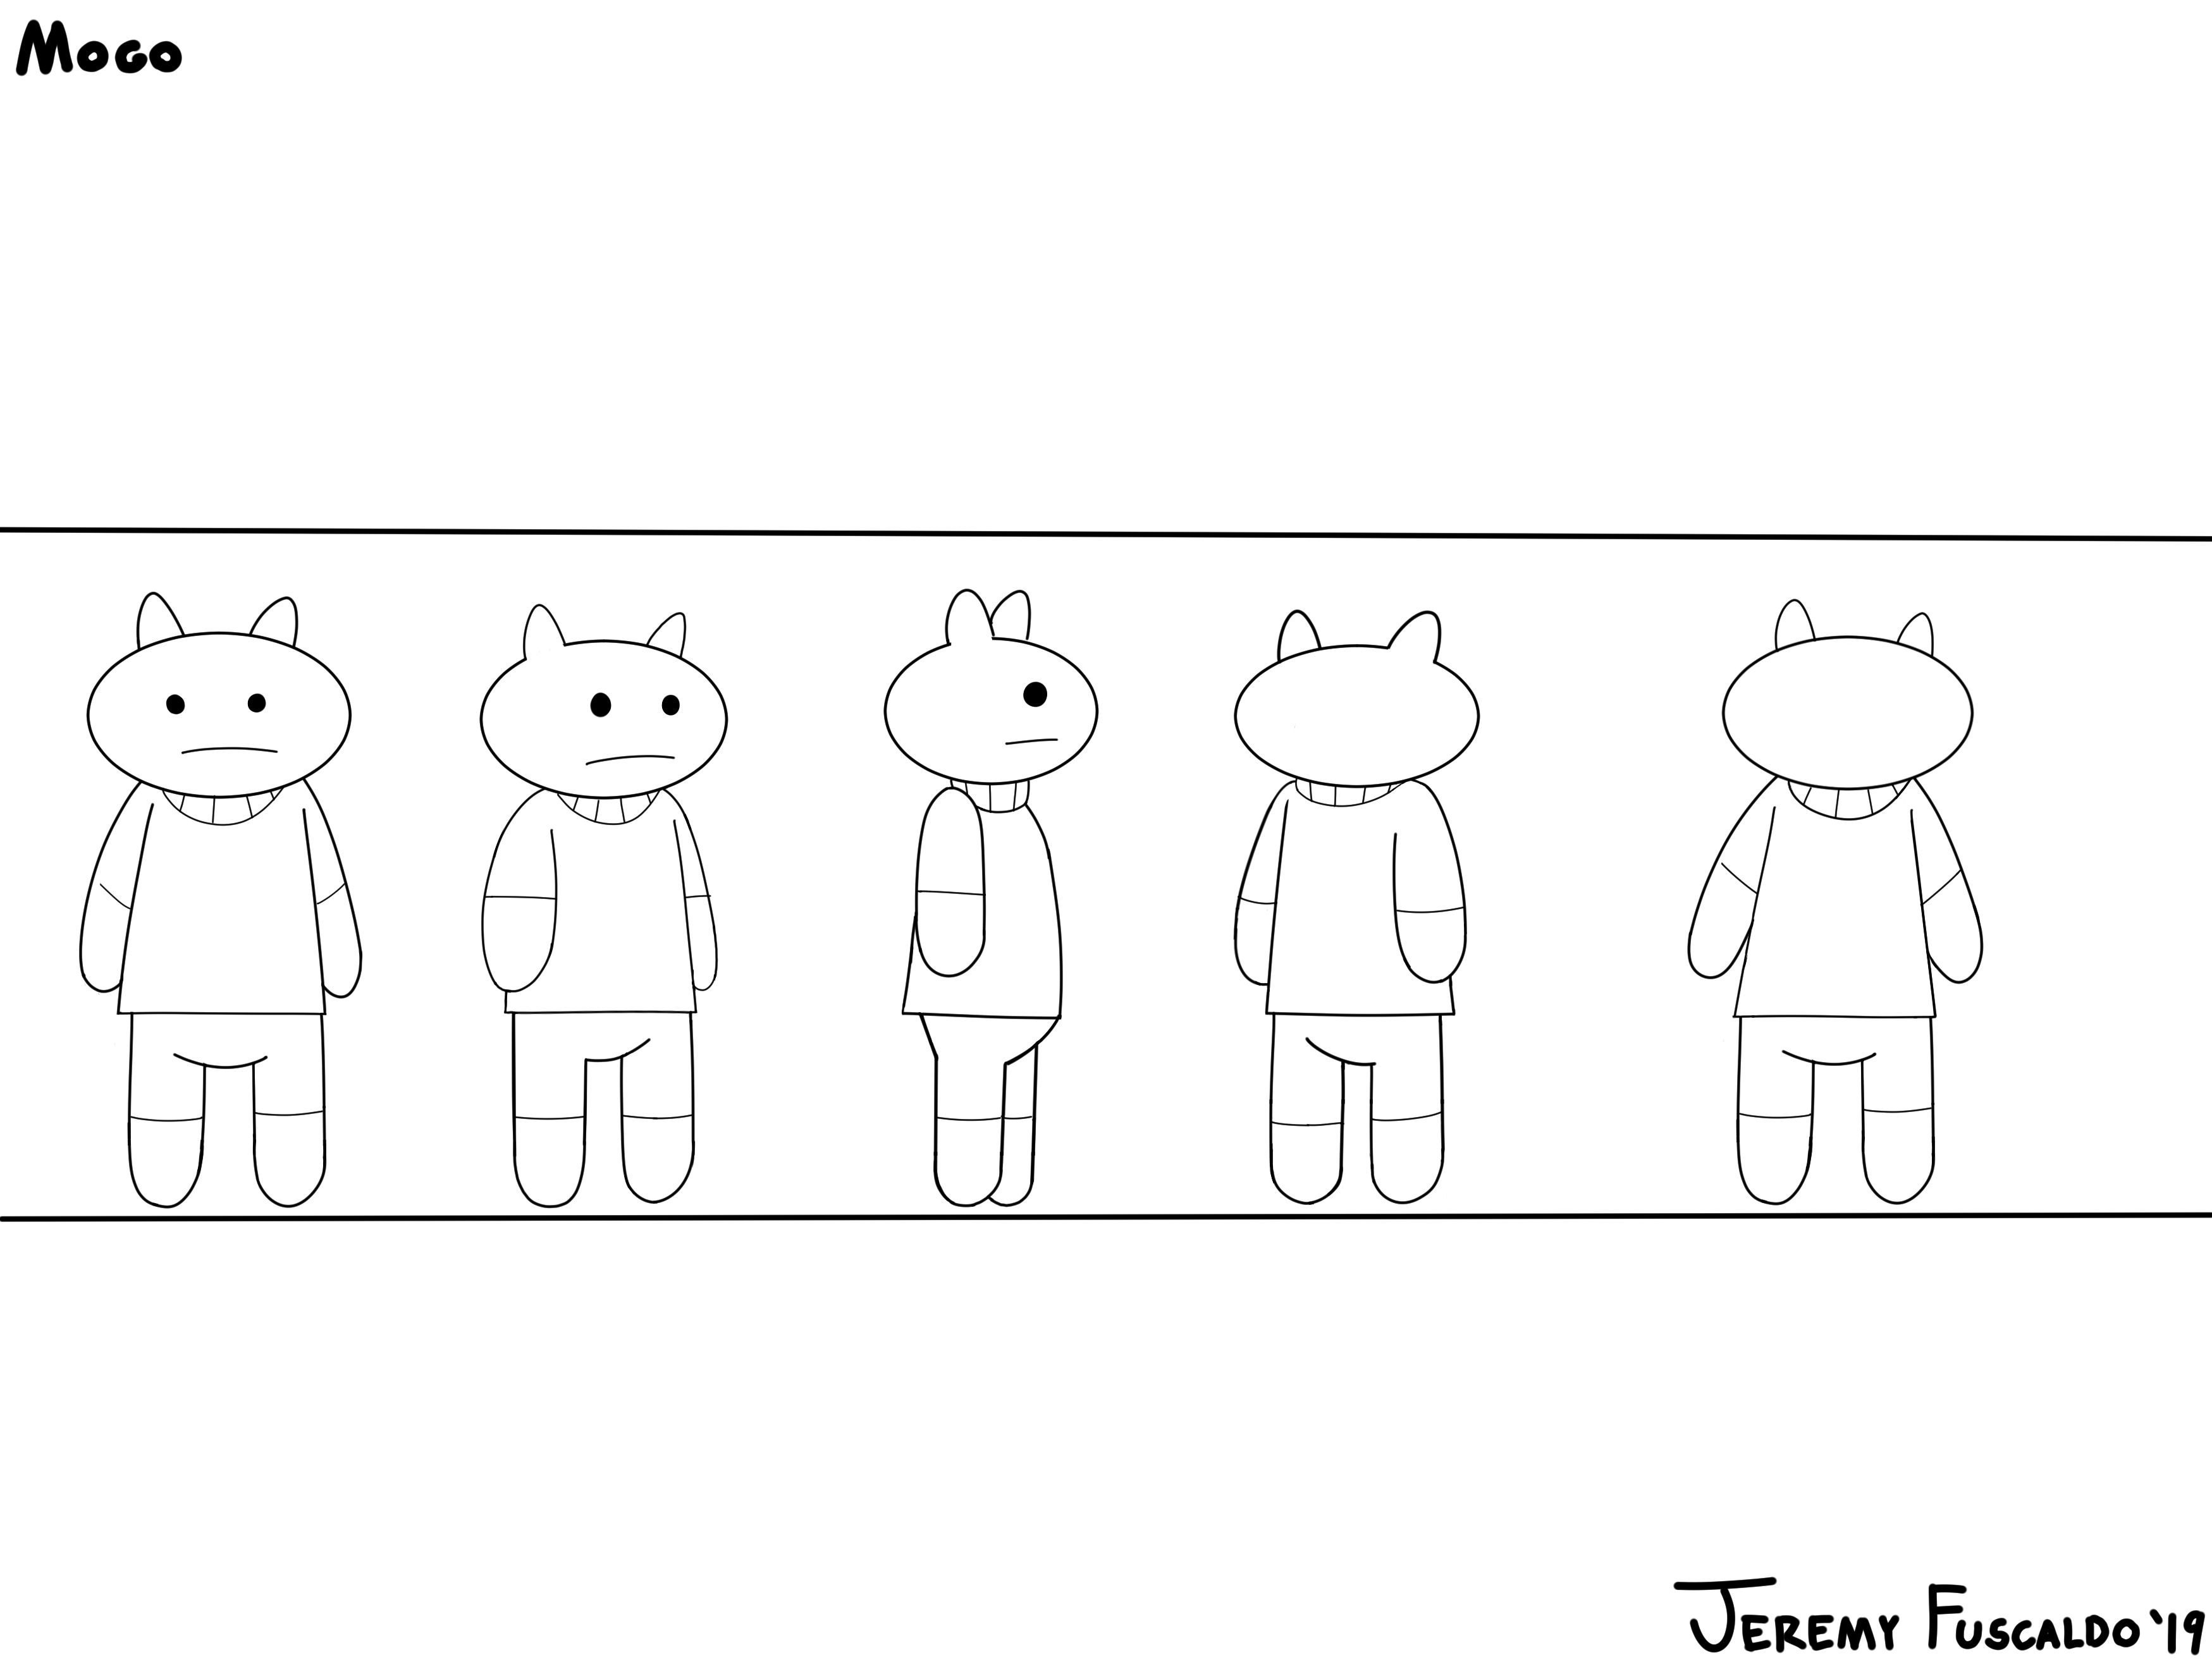 Character Design Mogo #1 BW